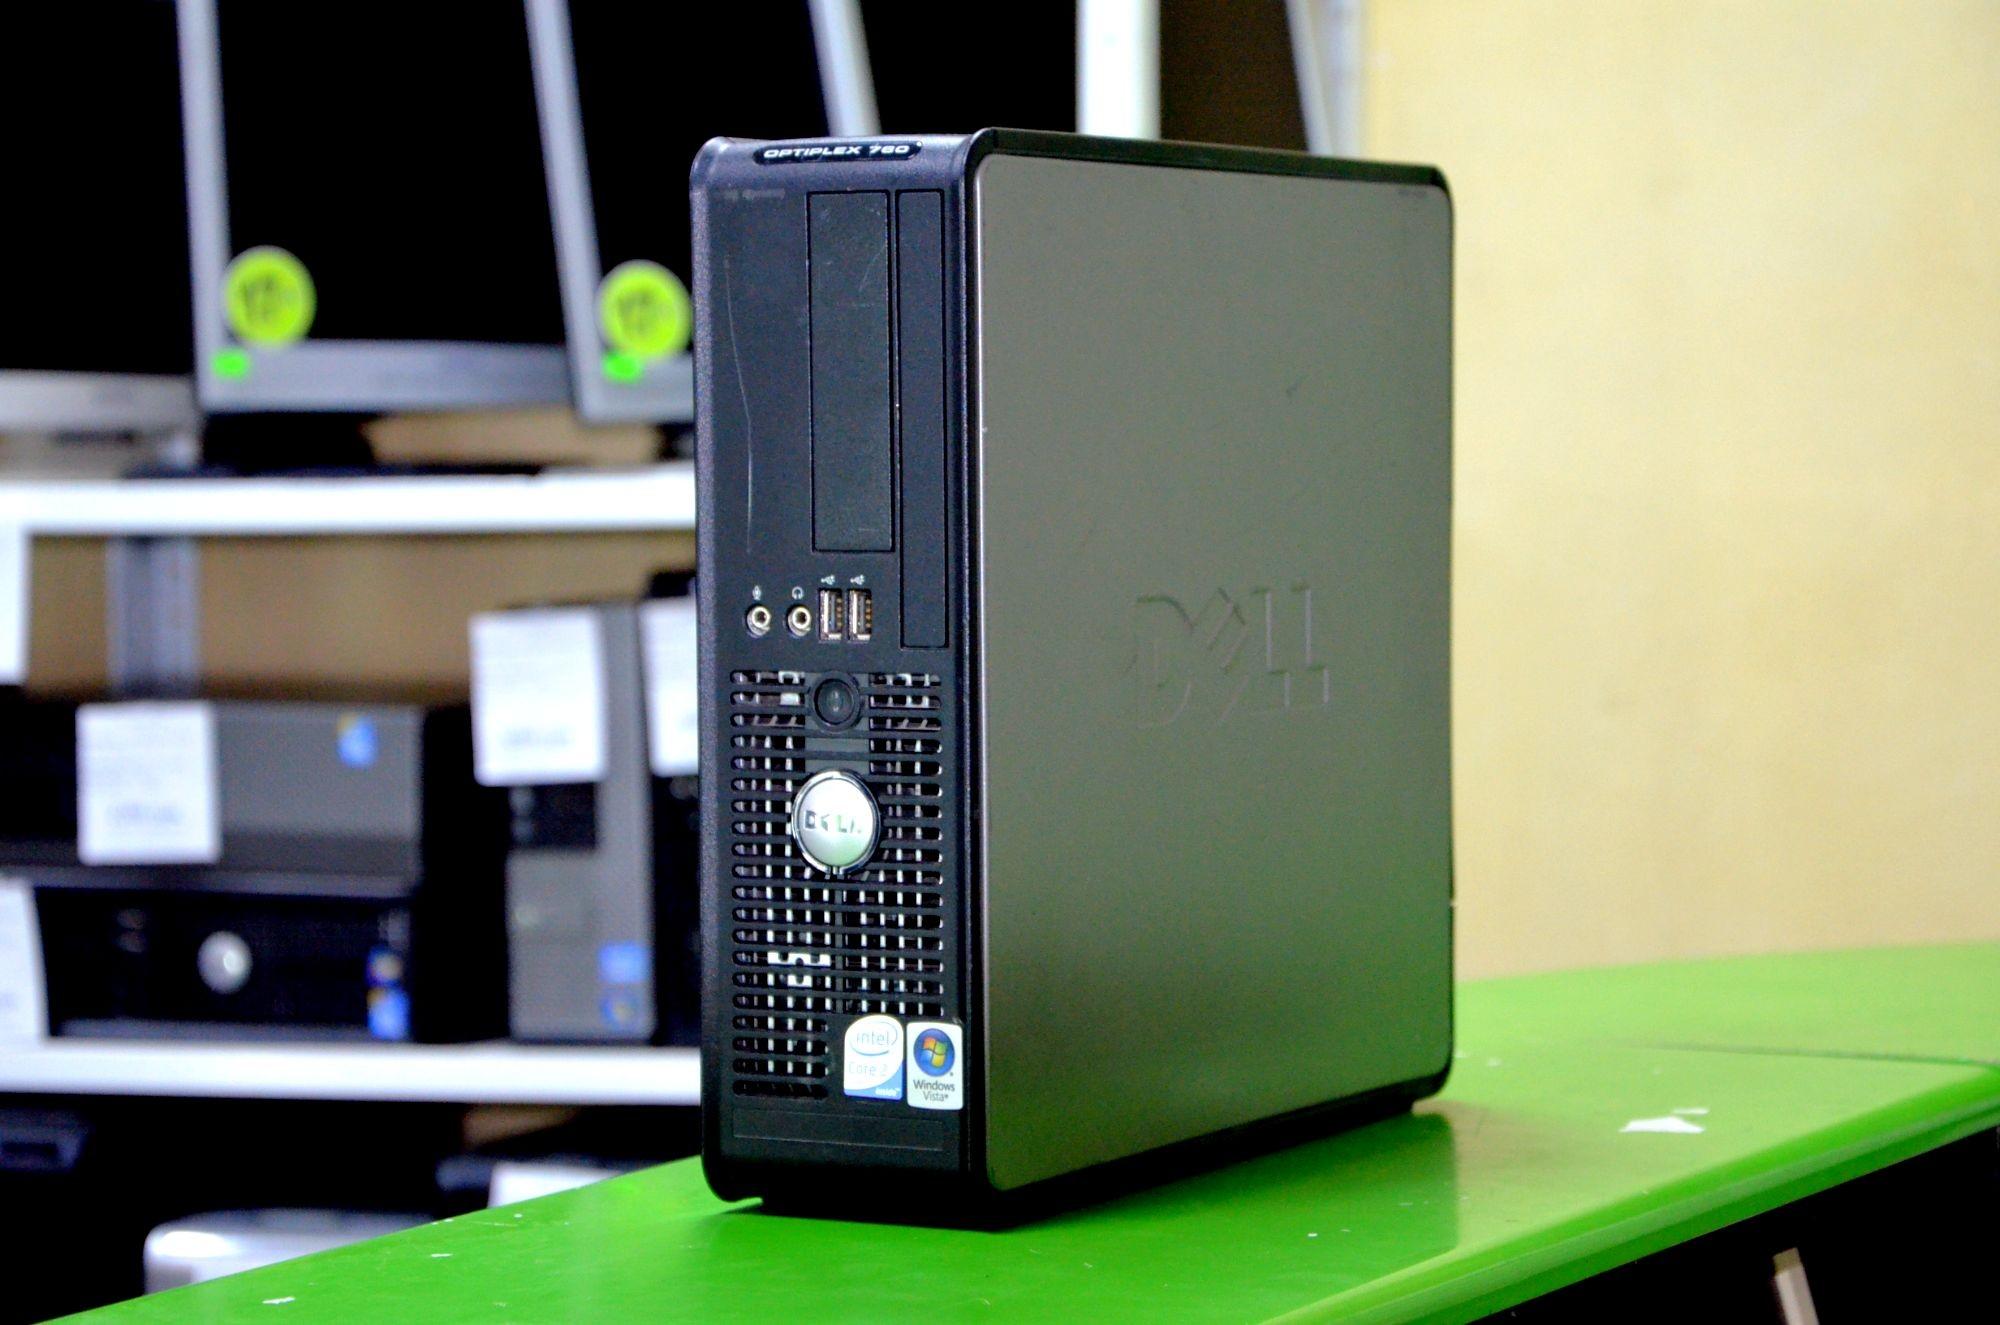 Dell Optiplex 380 купить Одессе